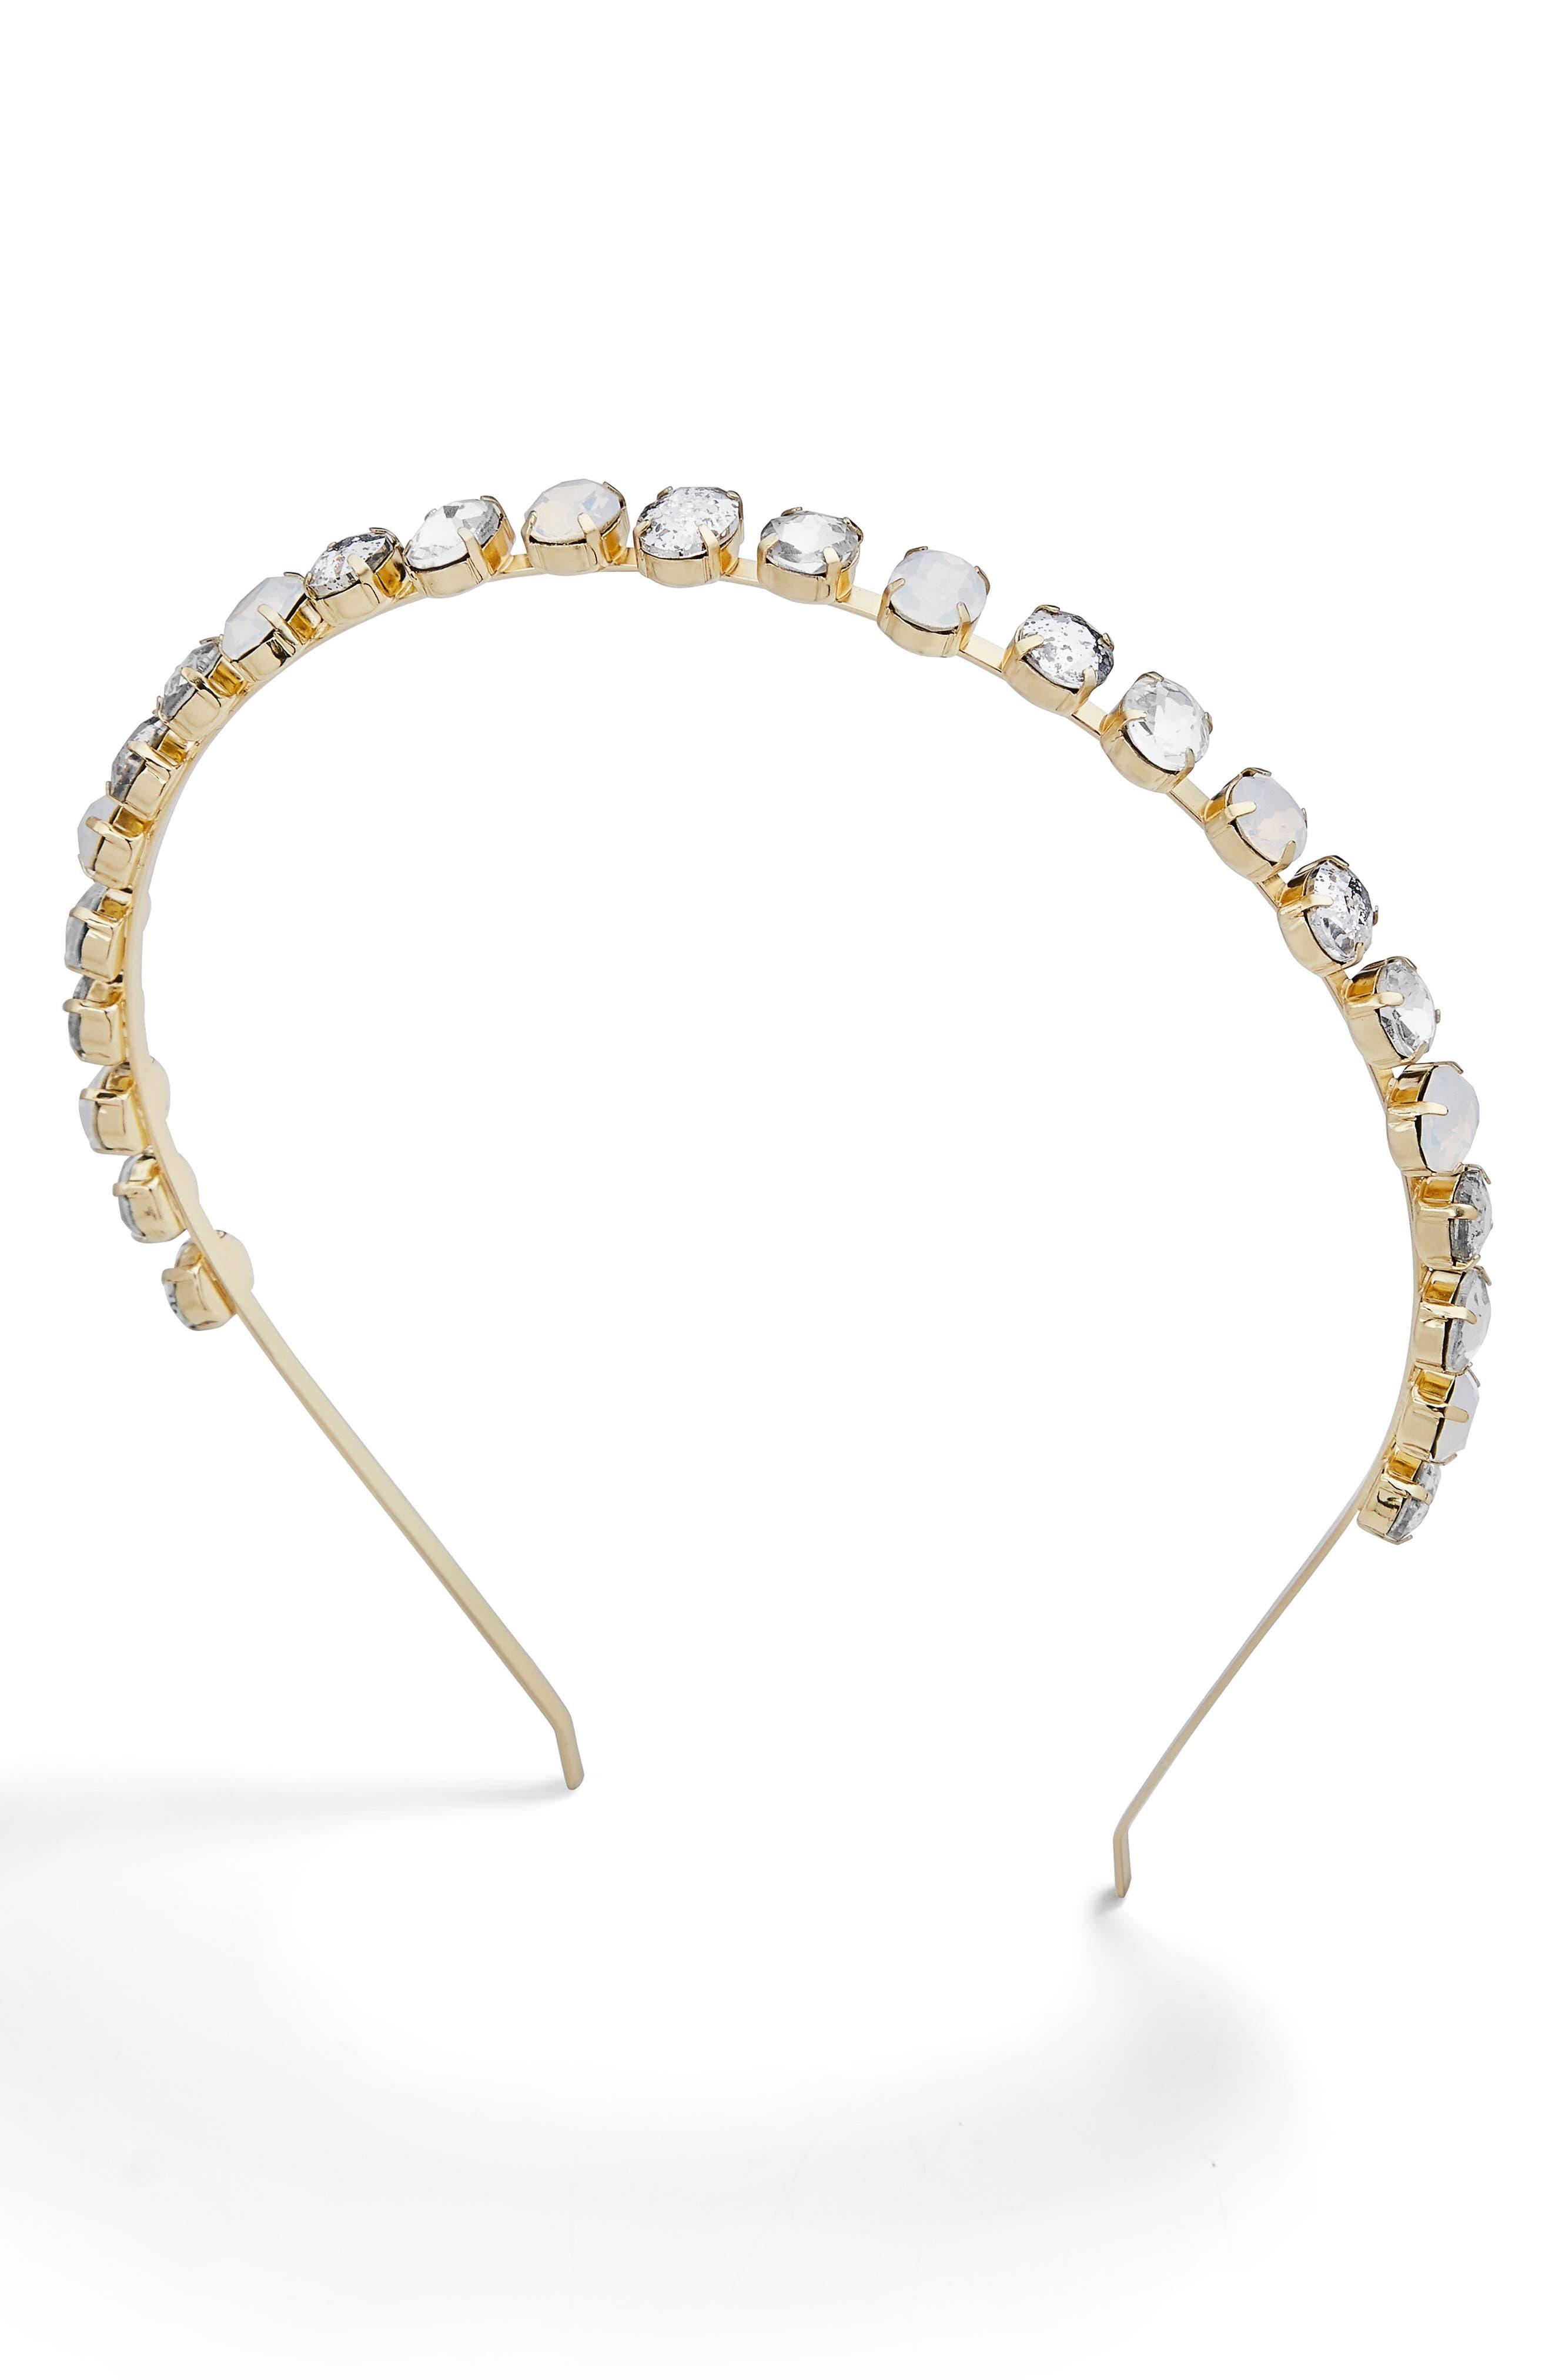 x Micaela Erlanger Royal Treatment Embellished Headband,                         Main,                         color, PASTEL MULTI/ GOLD